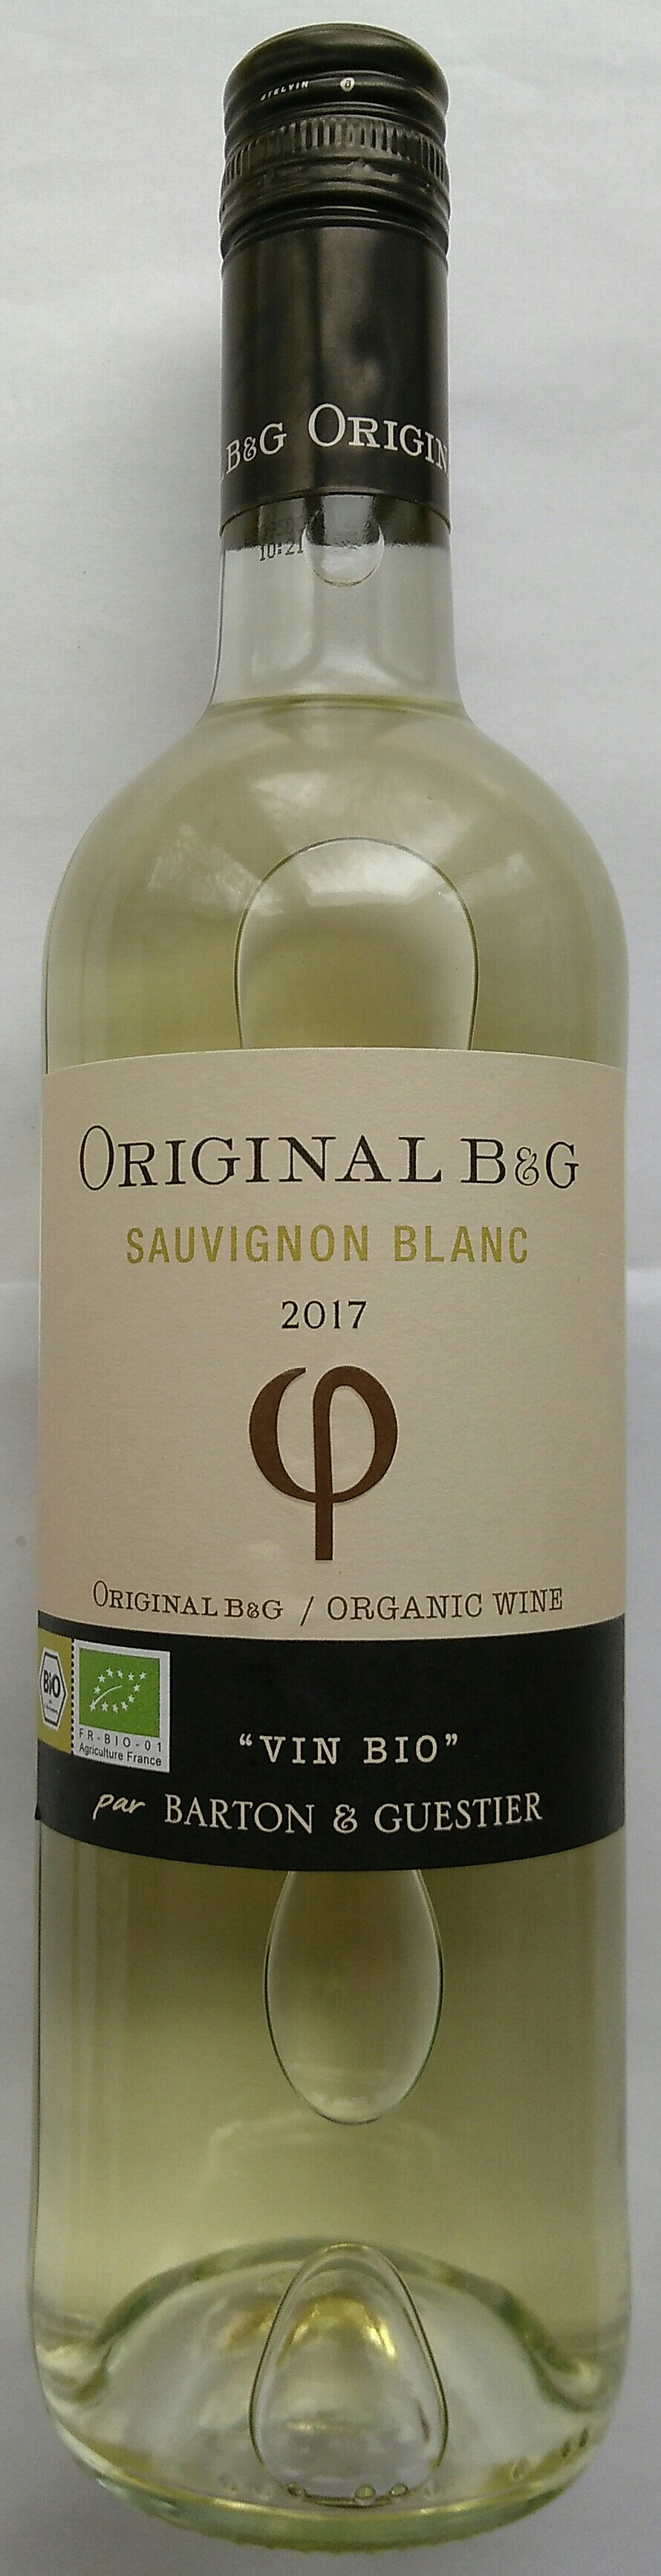 Sauvignon Blanc - Product - de